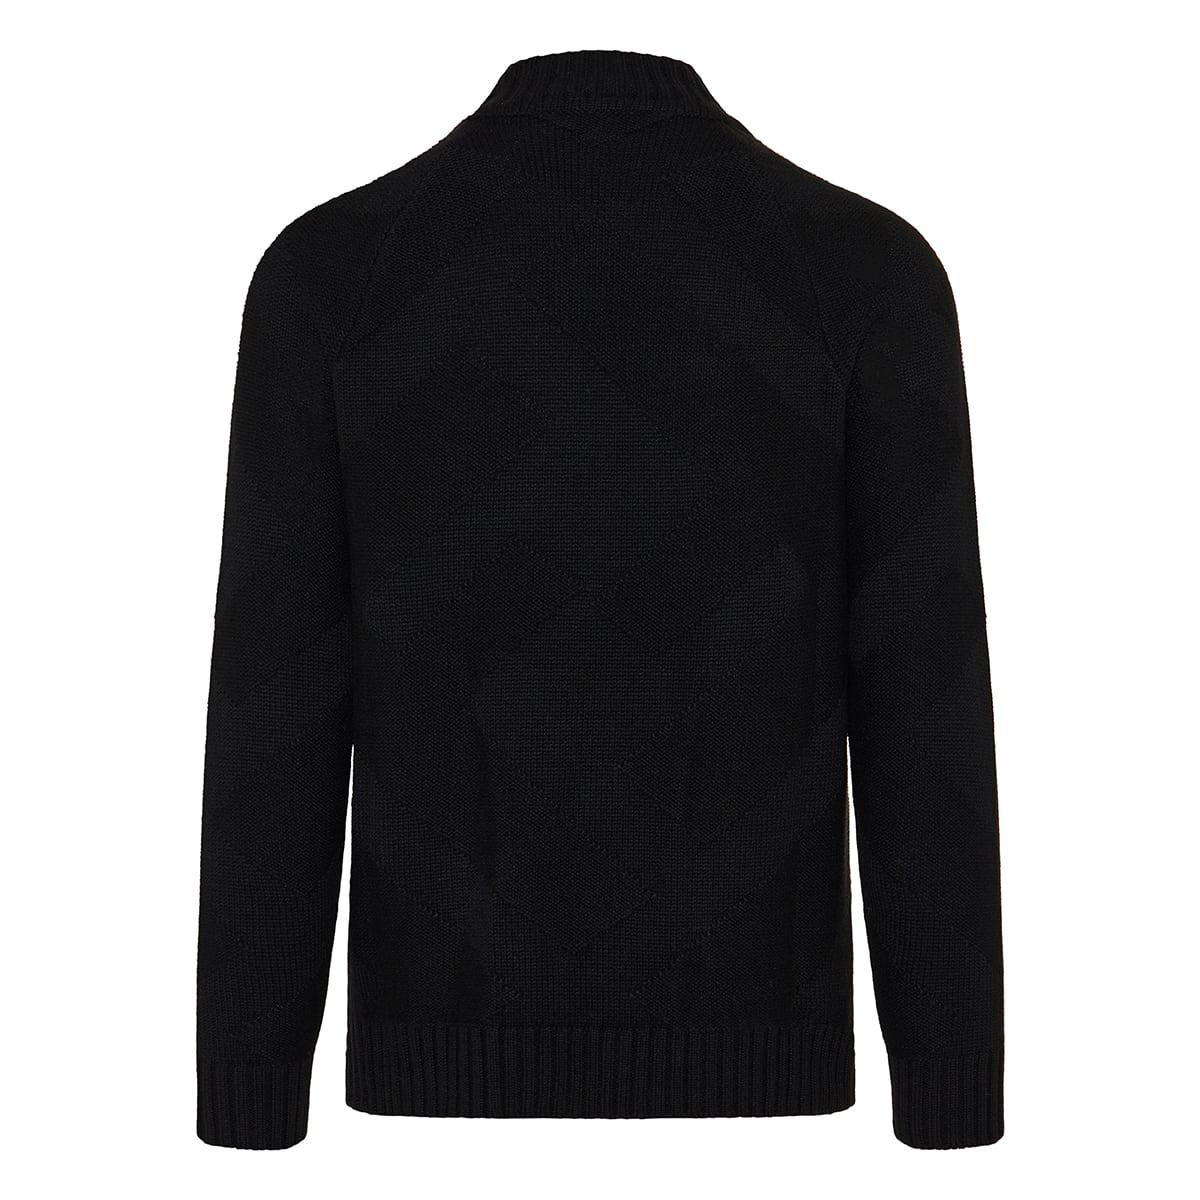 FF jacquard cashmere sweater